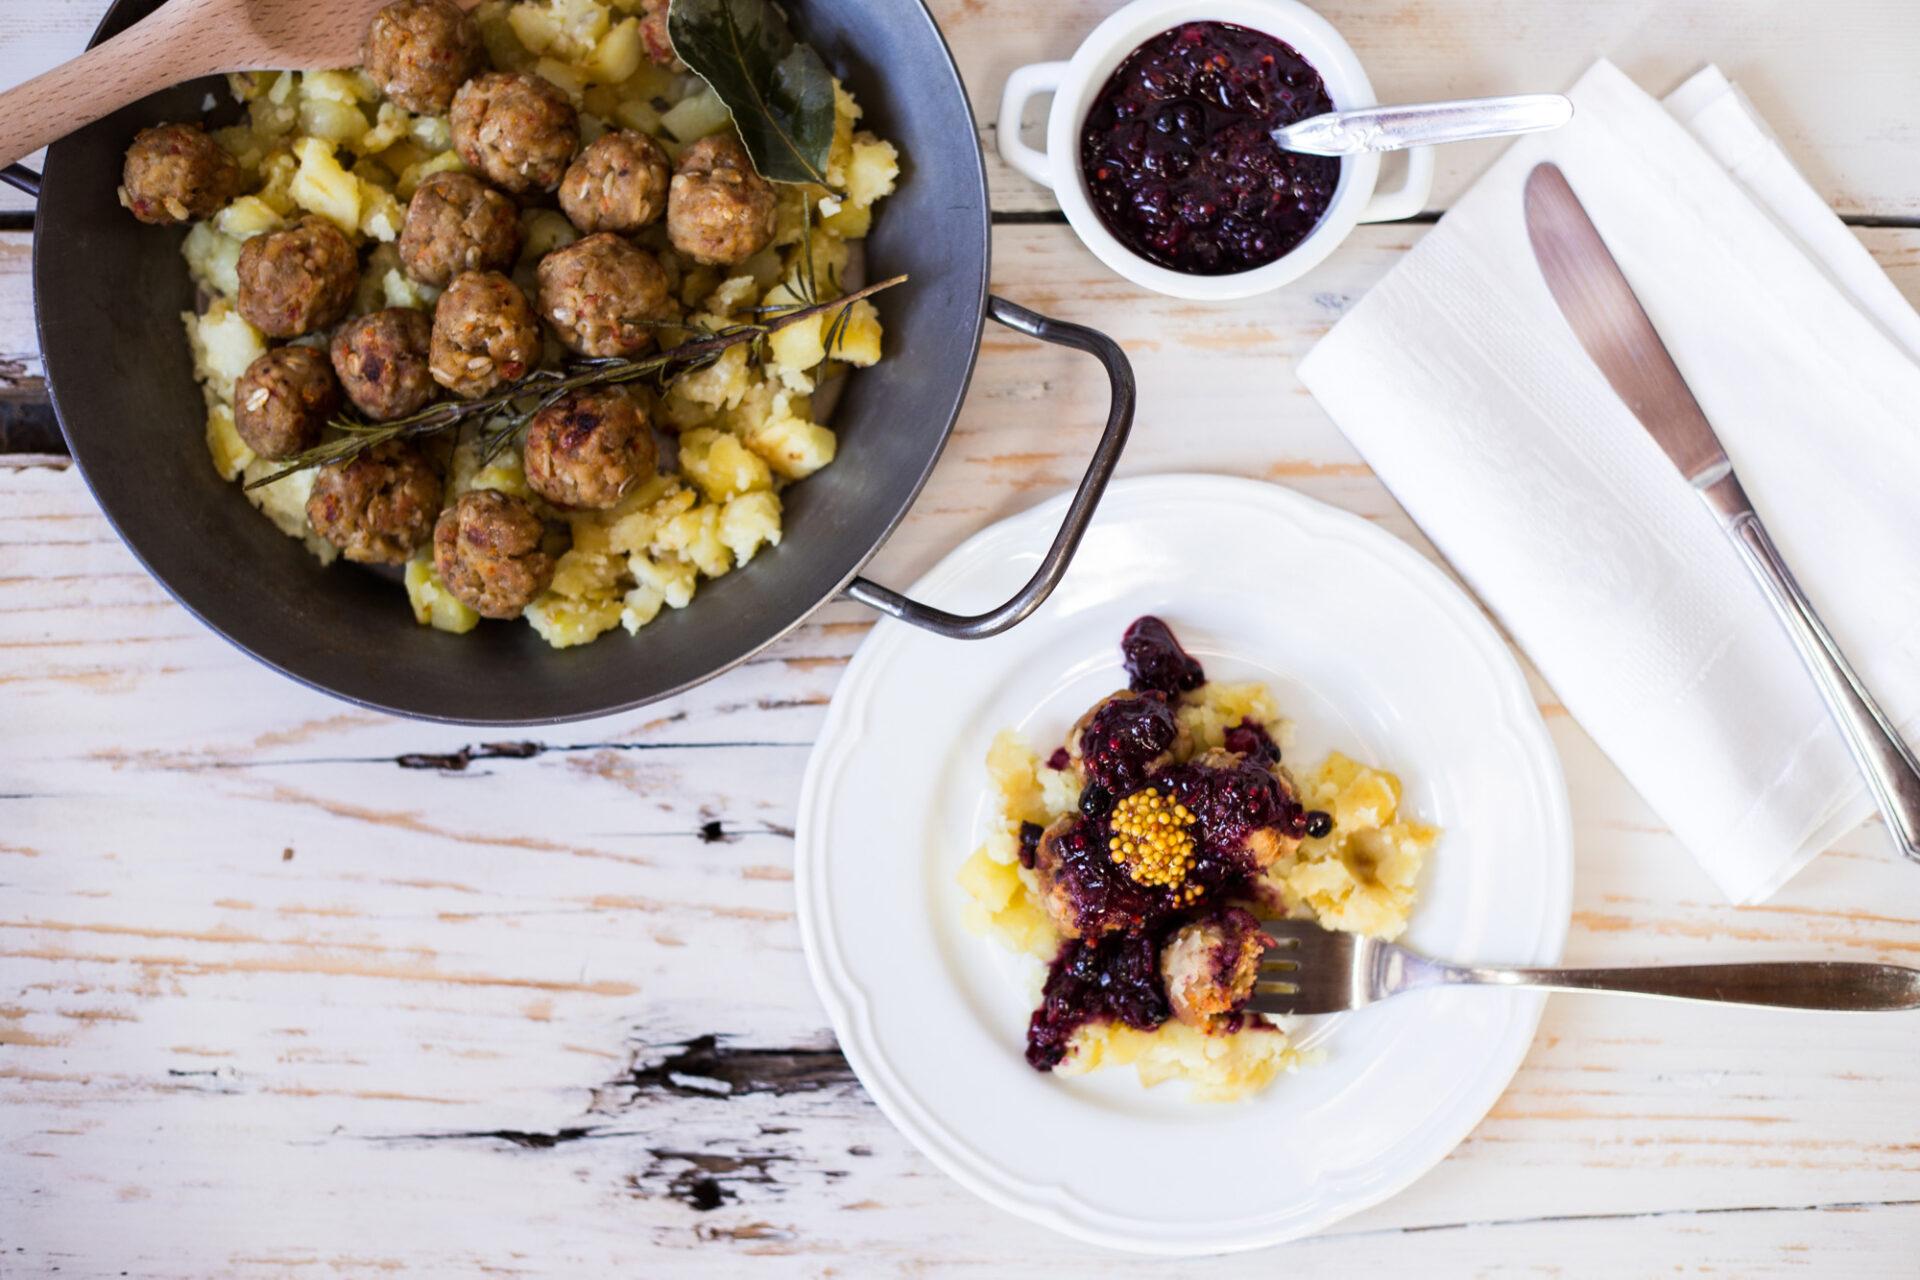 IMG 3707 2 - Secondi vegetariani: 10 gustose ricette